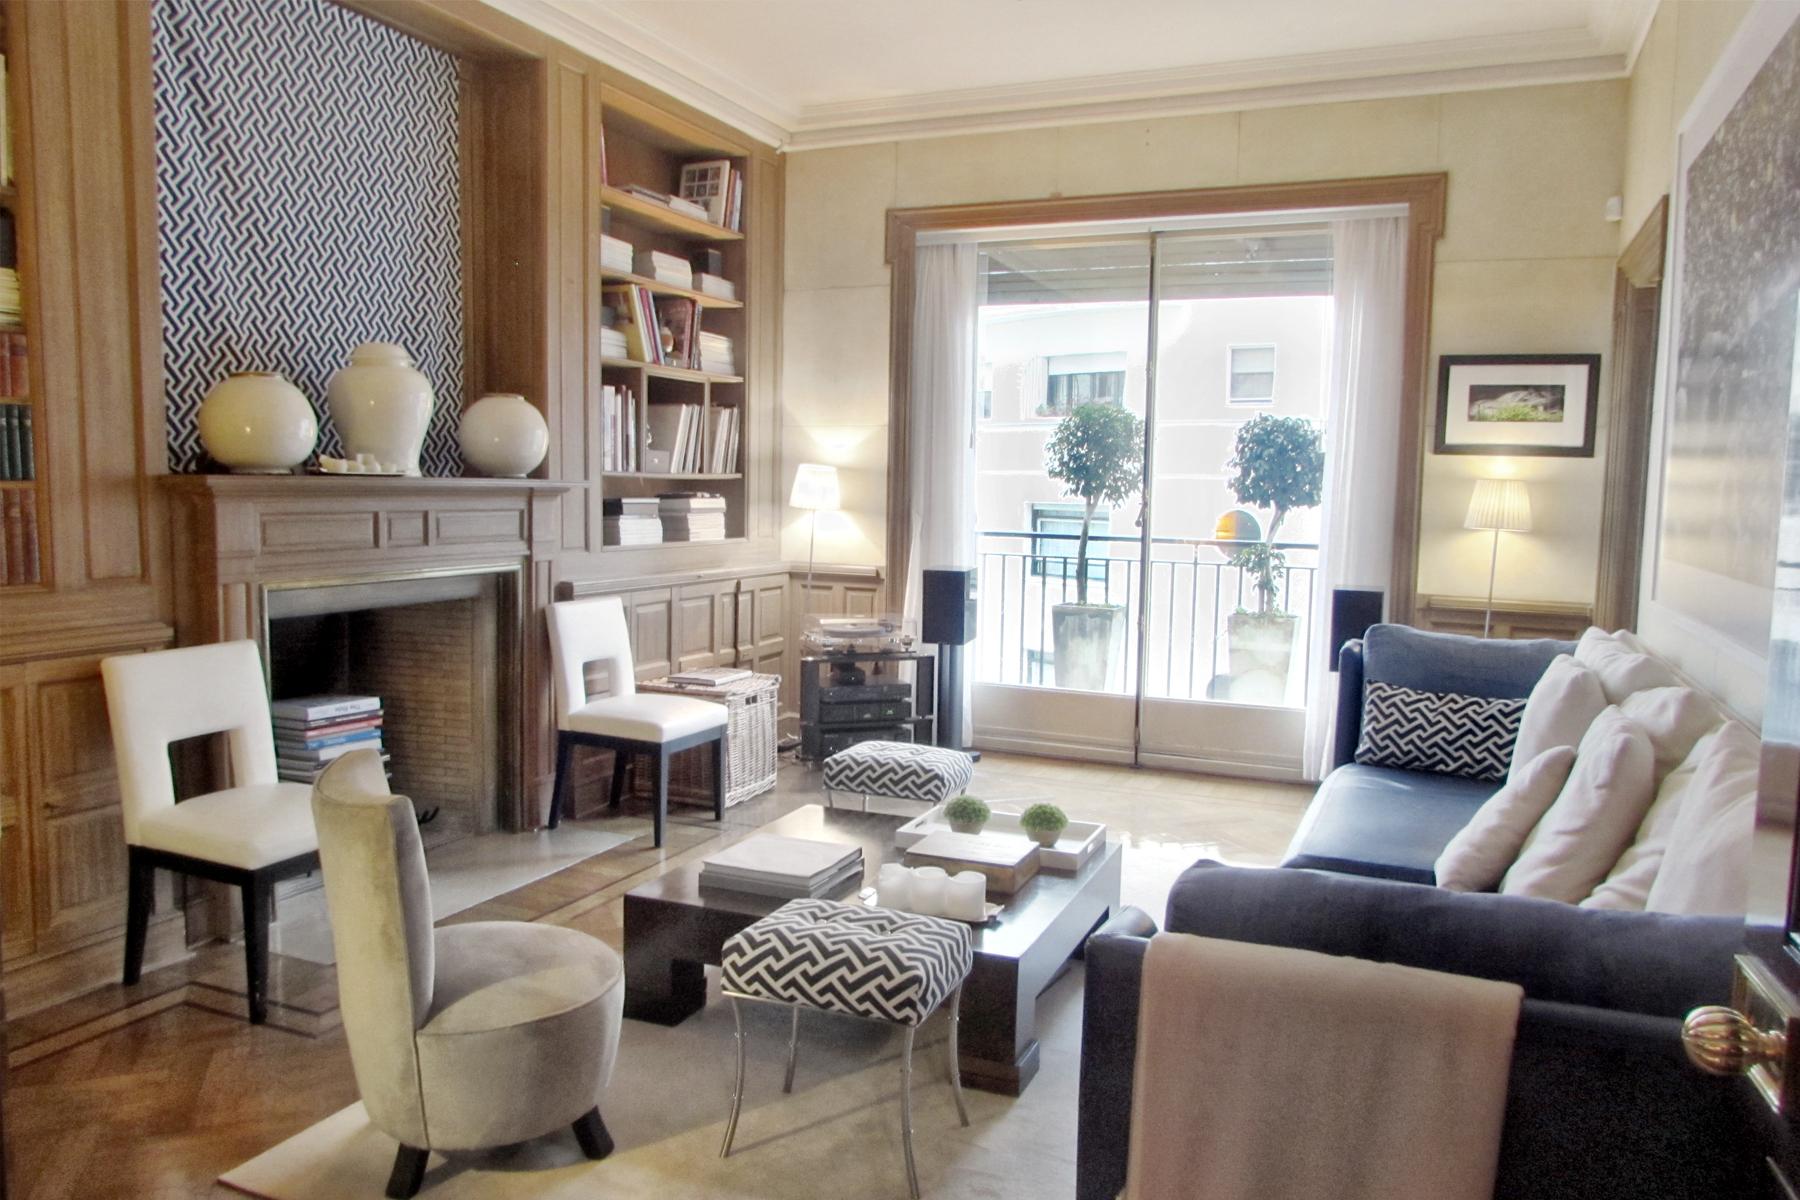 Apartments for Sale at Imposing 430 m2 apartment Avenida Alvear 1400 Buenos Aires, Buenos Aires C1014AAP Argentina